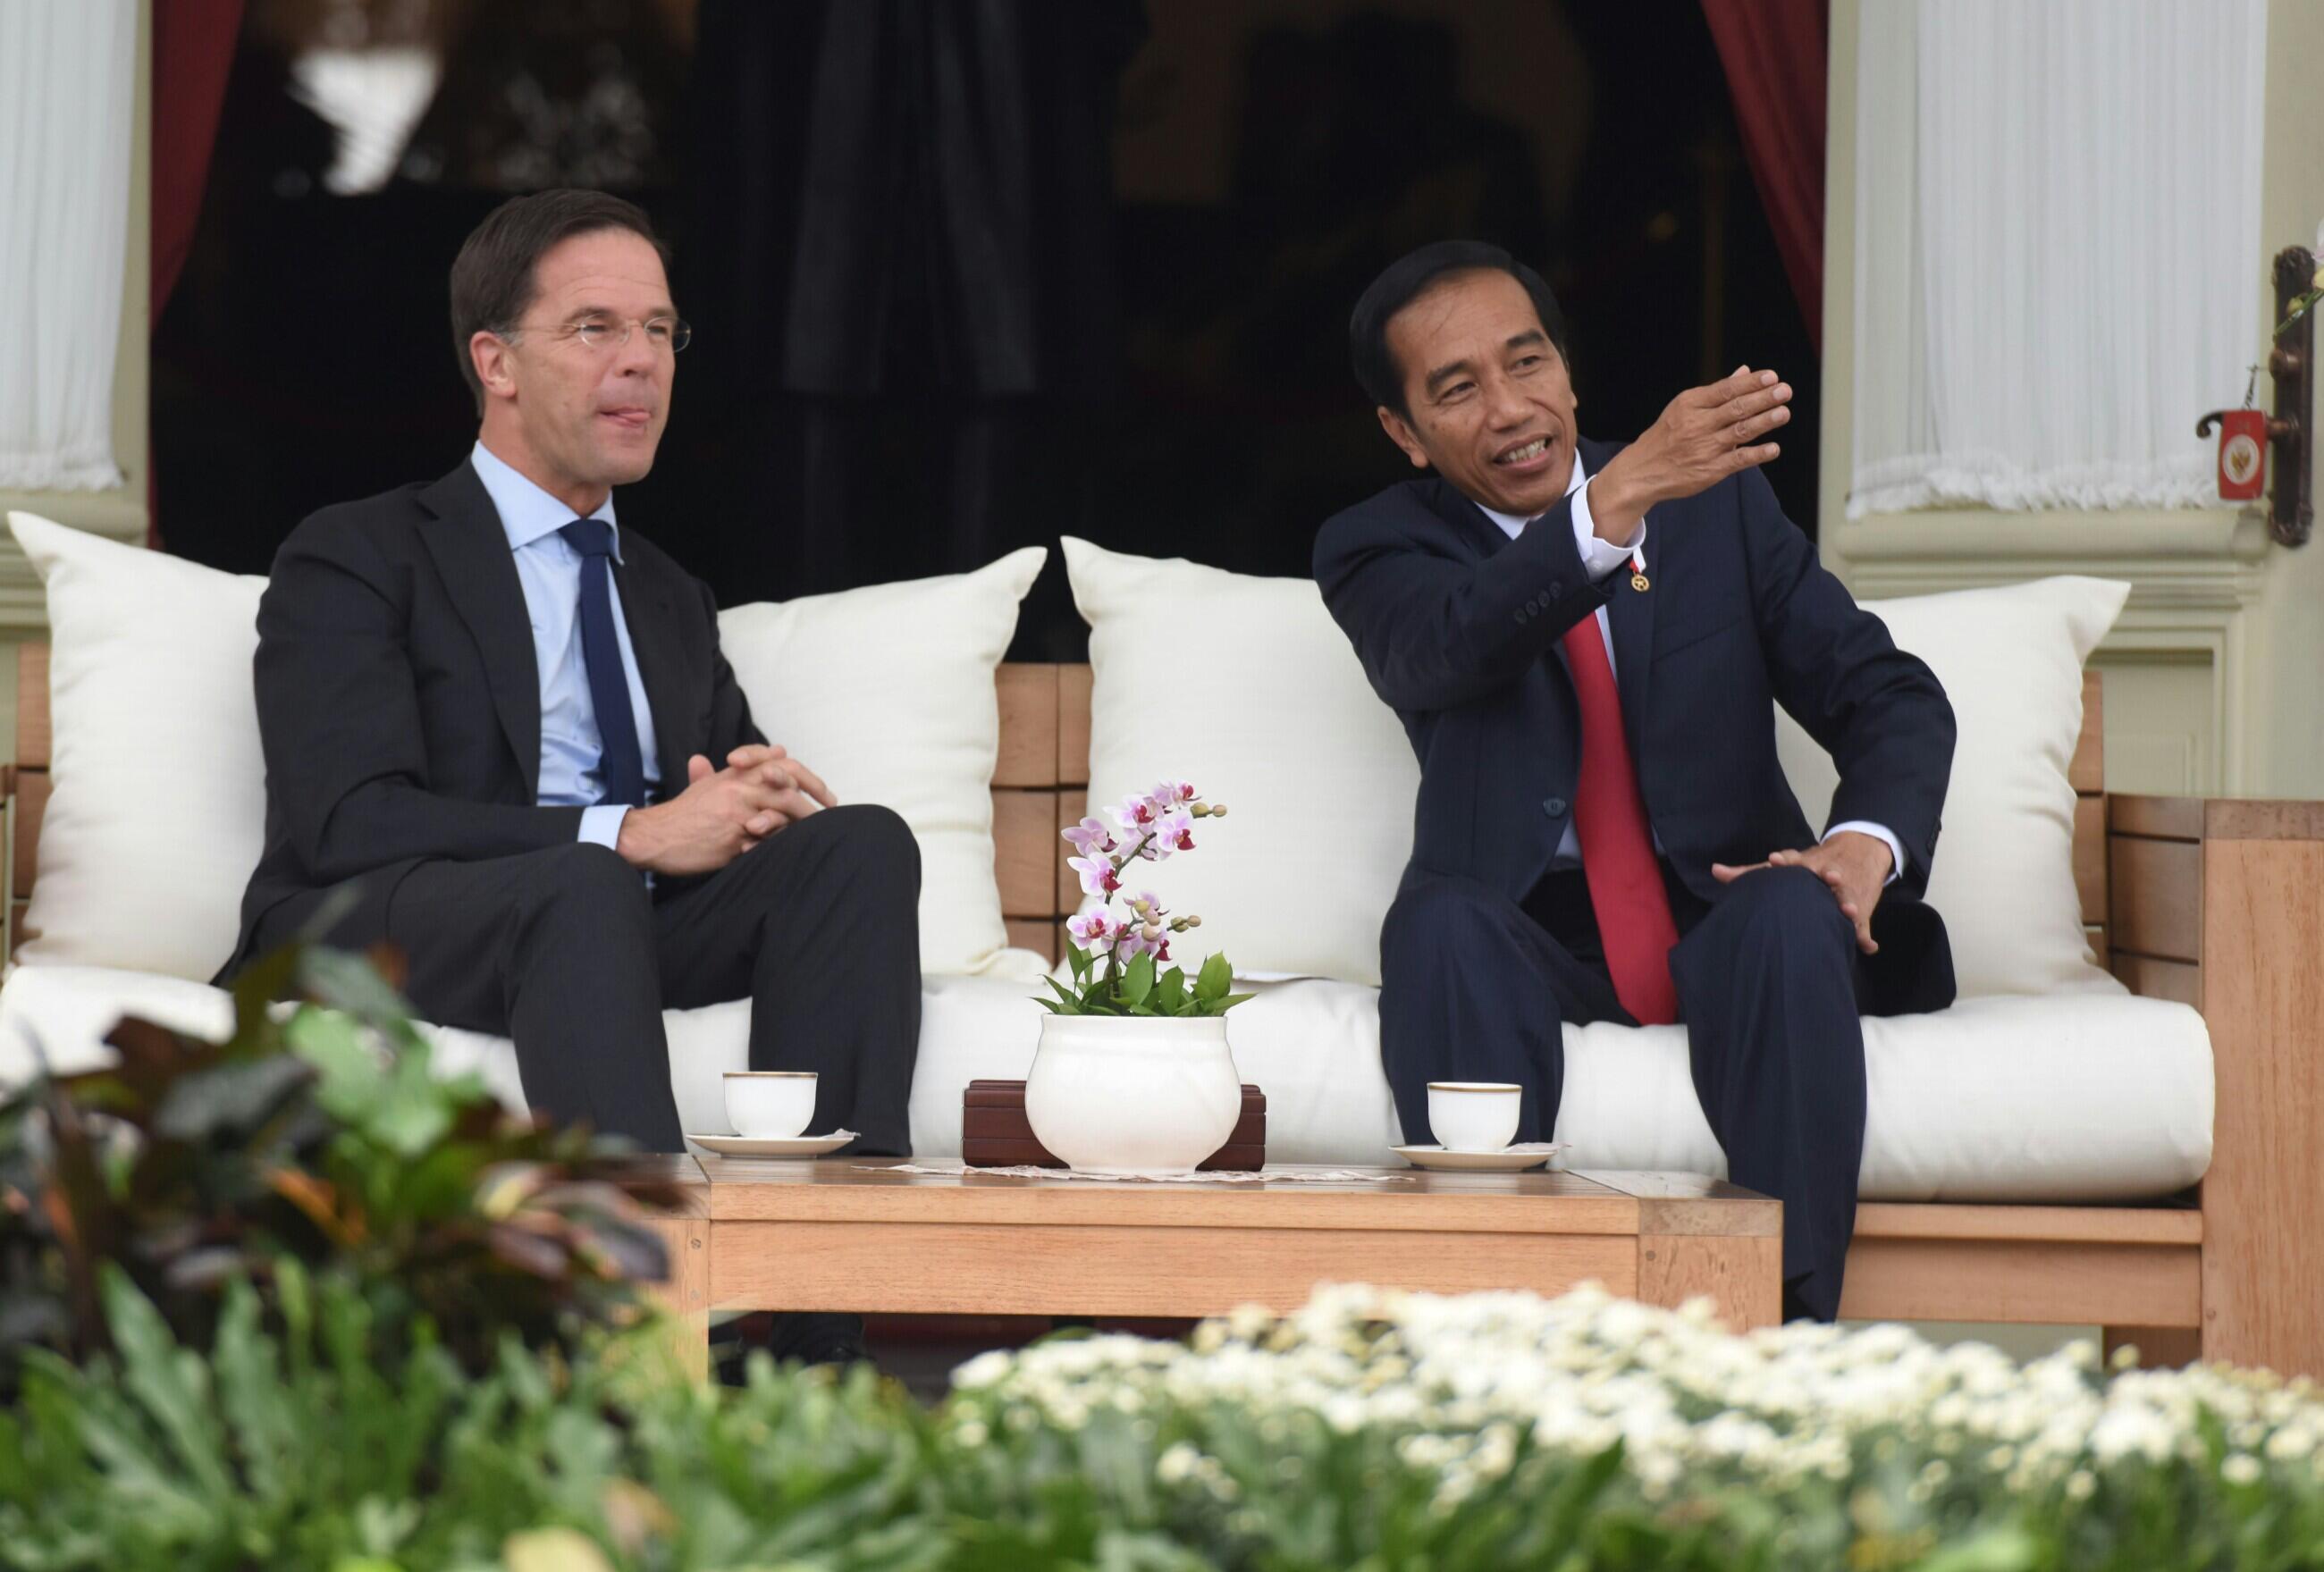 PM Belanda Mark Rutte Kunjungi Presiden Jokowi di Bogor